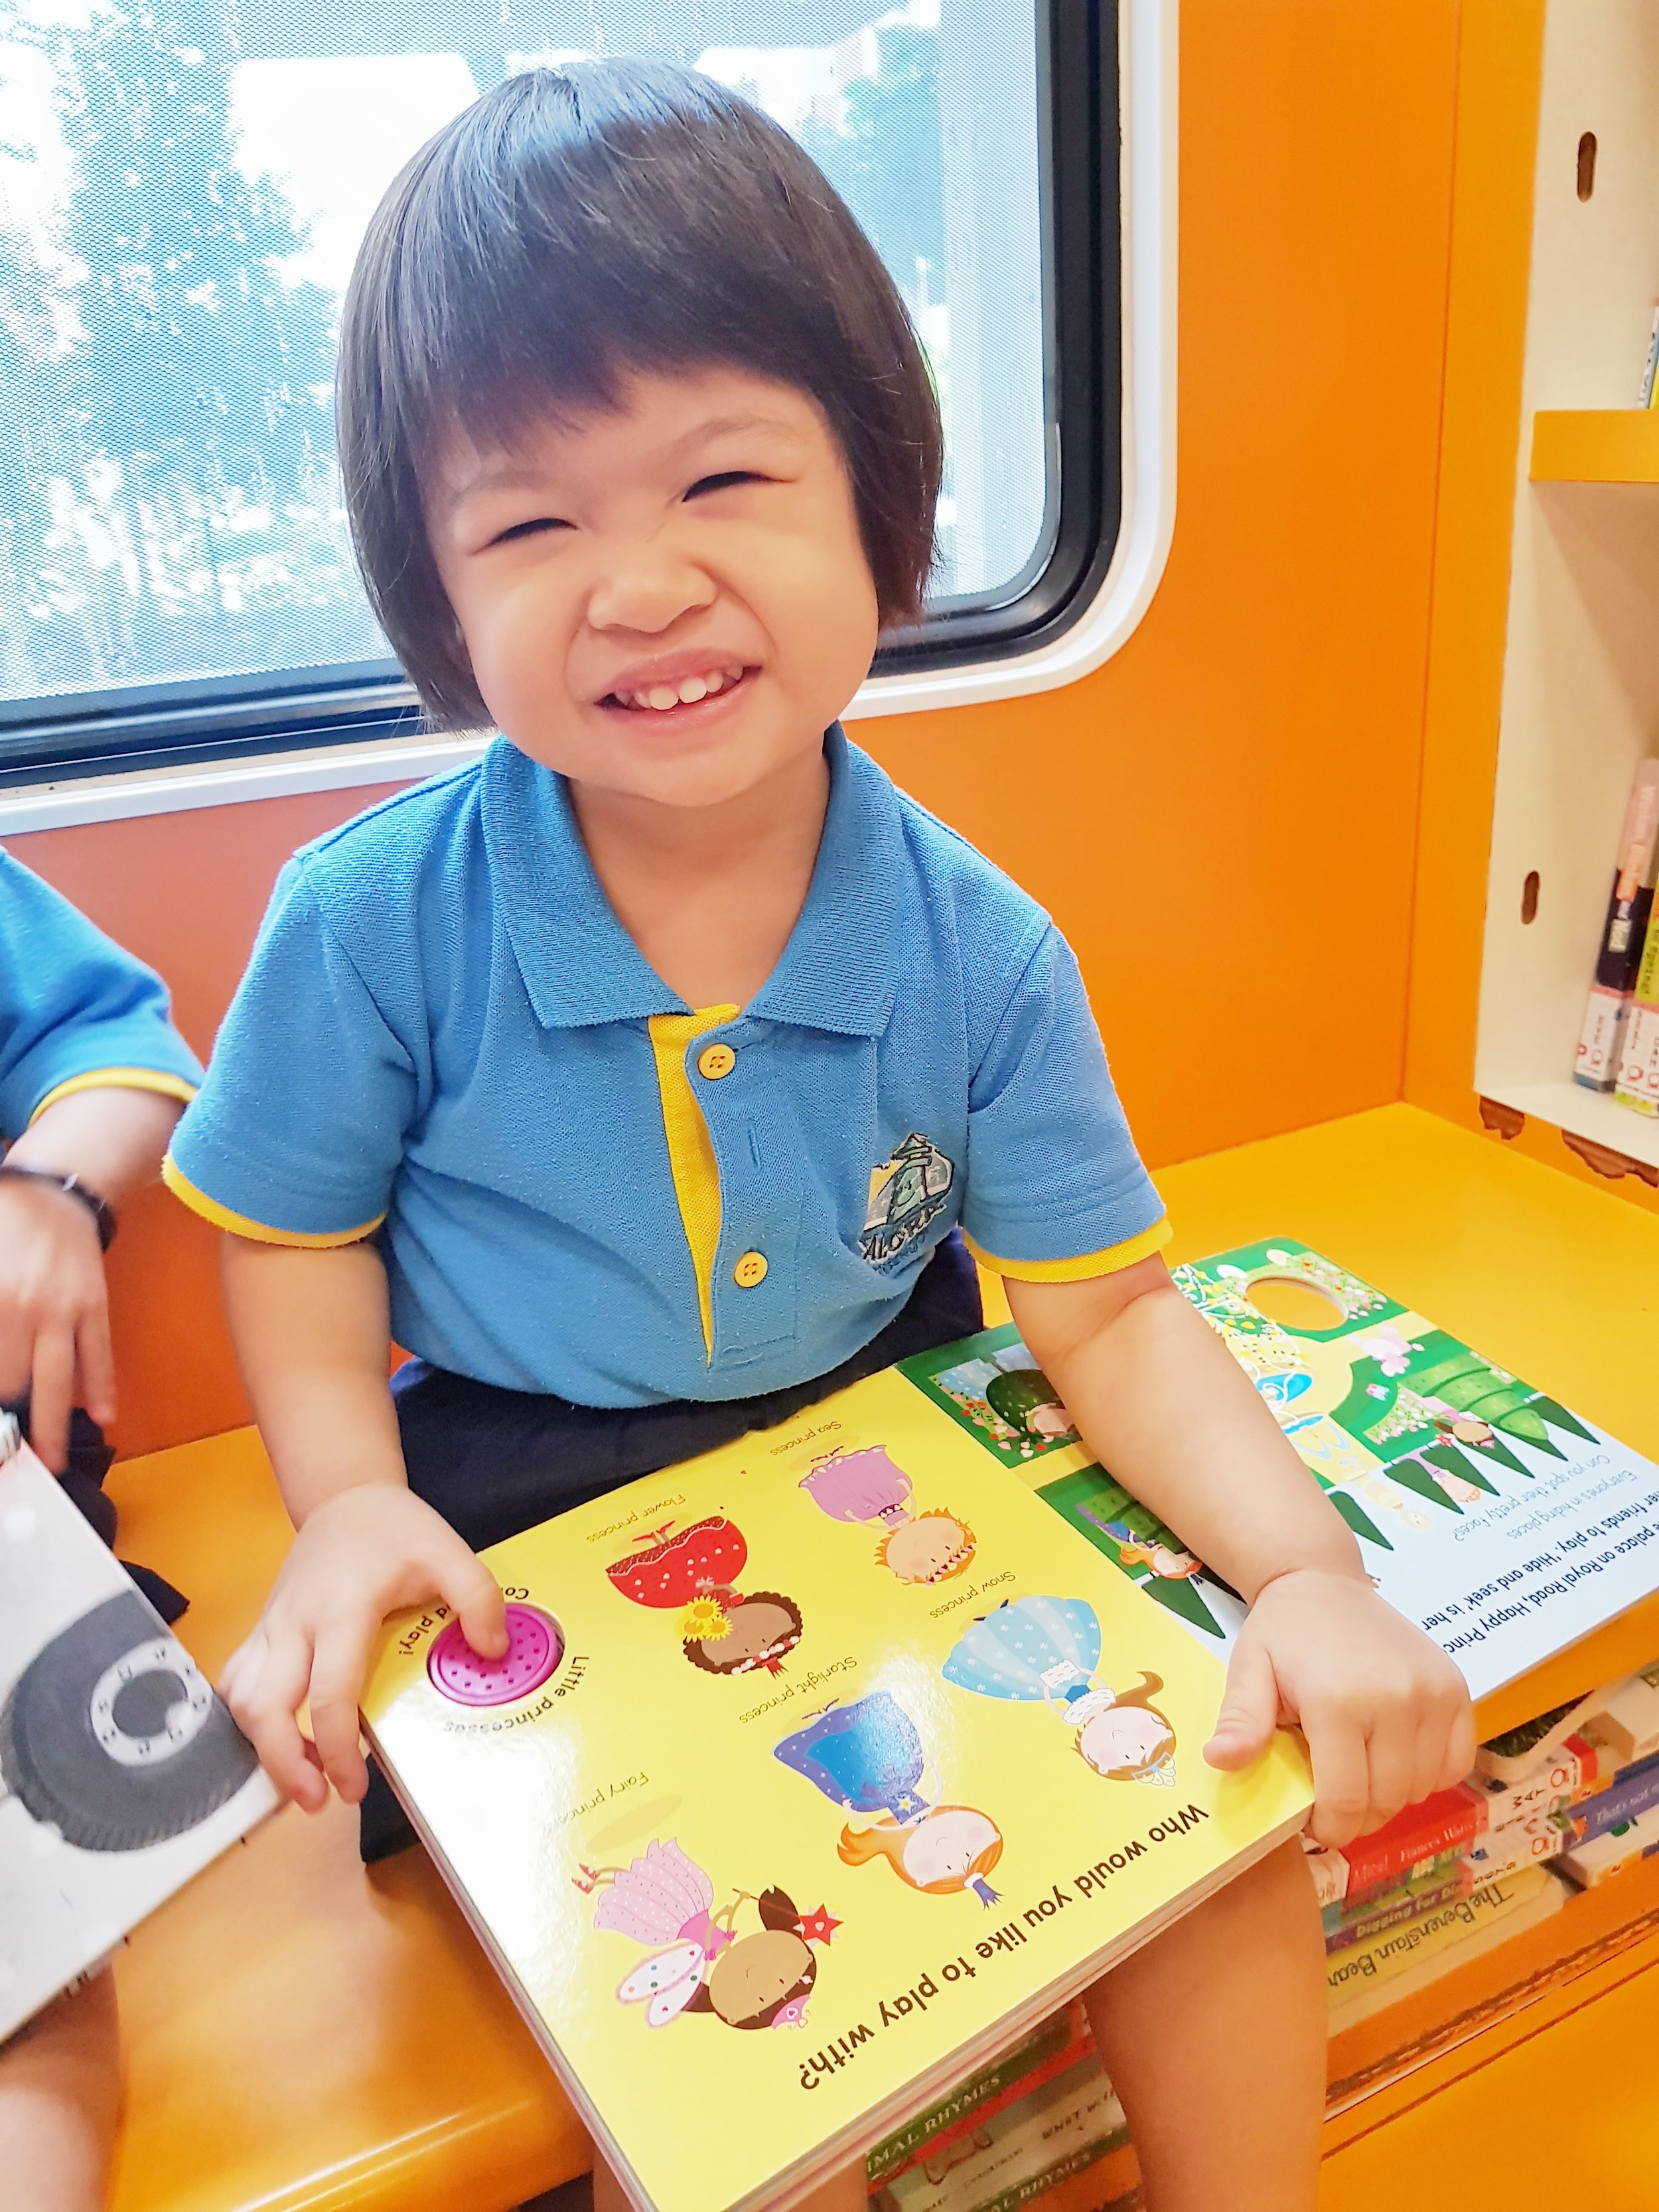 Alora Mini Molly Library Bus 4 (16 March 2018).jpeg